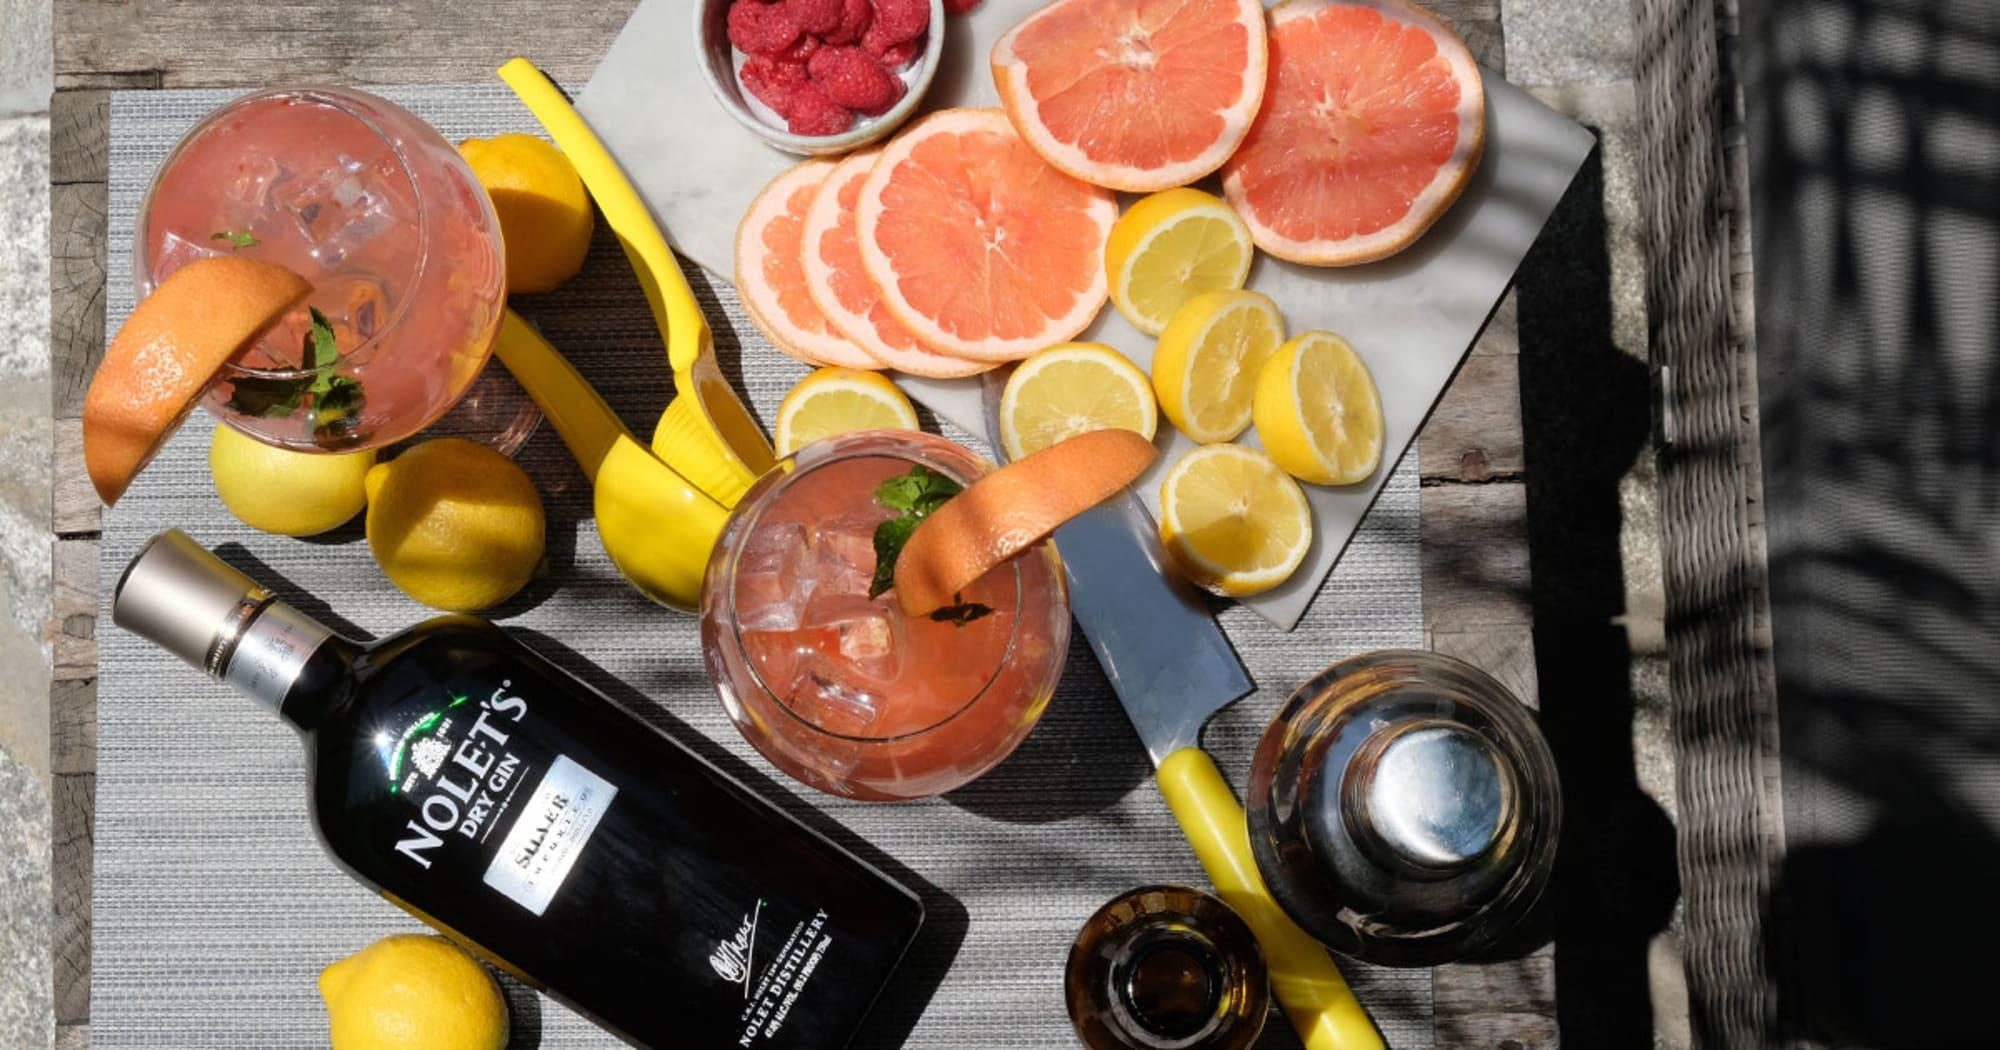 NOLET's Silver gin cocktails celebrate modern, fruity, fresh flavors